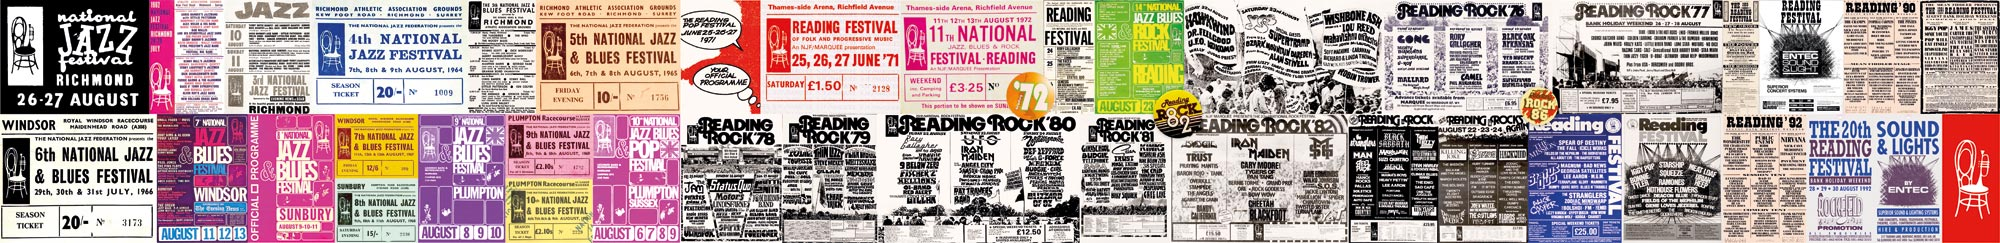 Reading festivals